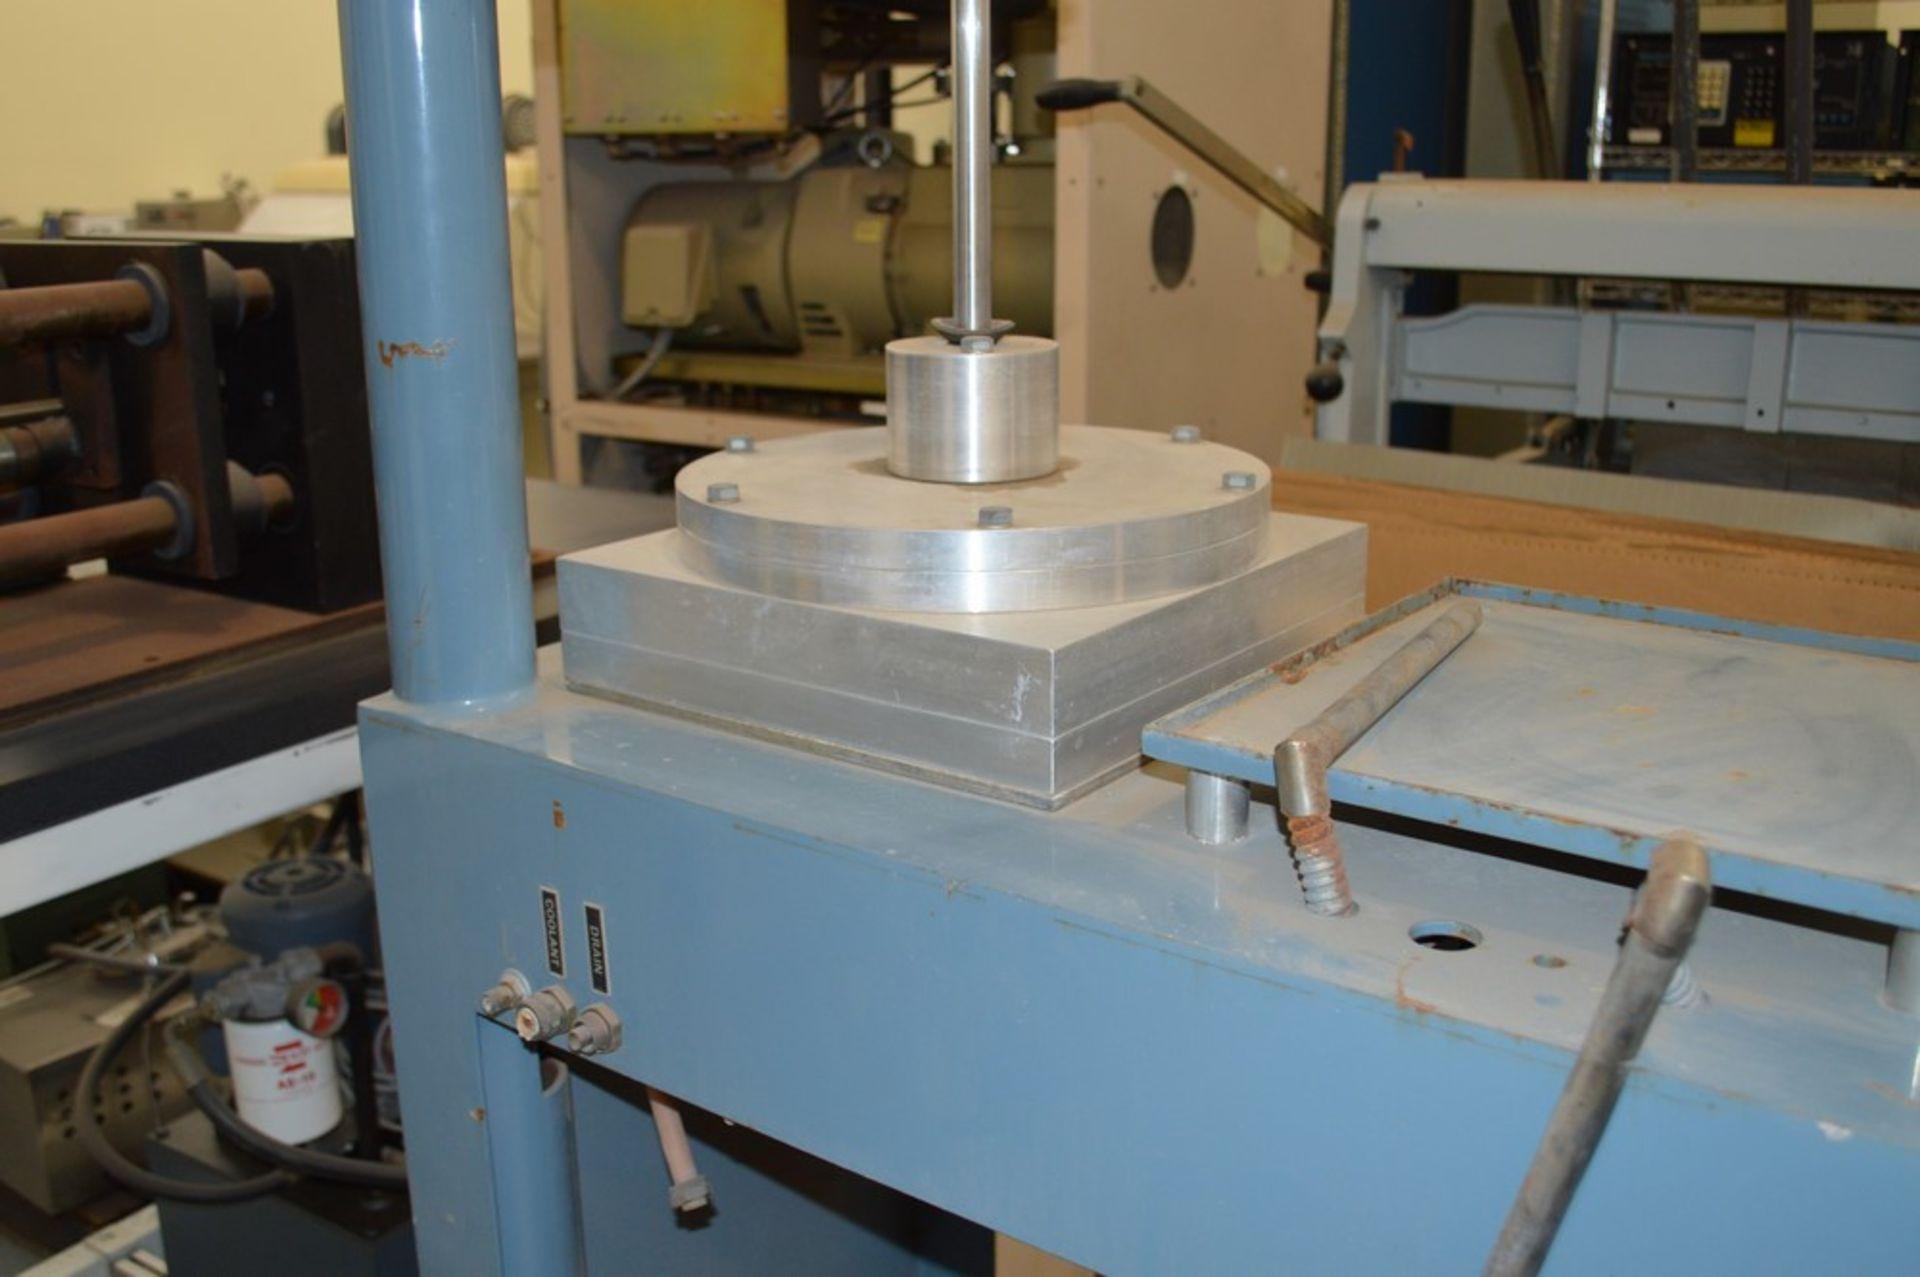 R Howard Strausbaugh, Model M-75, peunmatic press on skid. Mounting press - Image 4 of 6